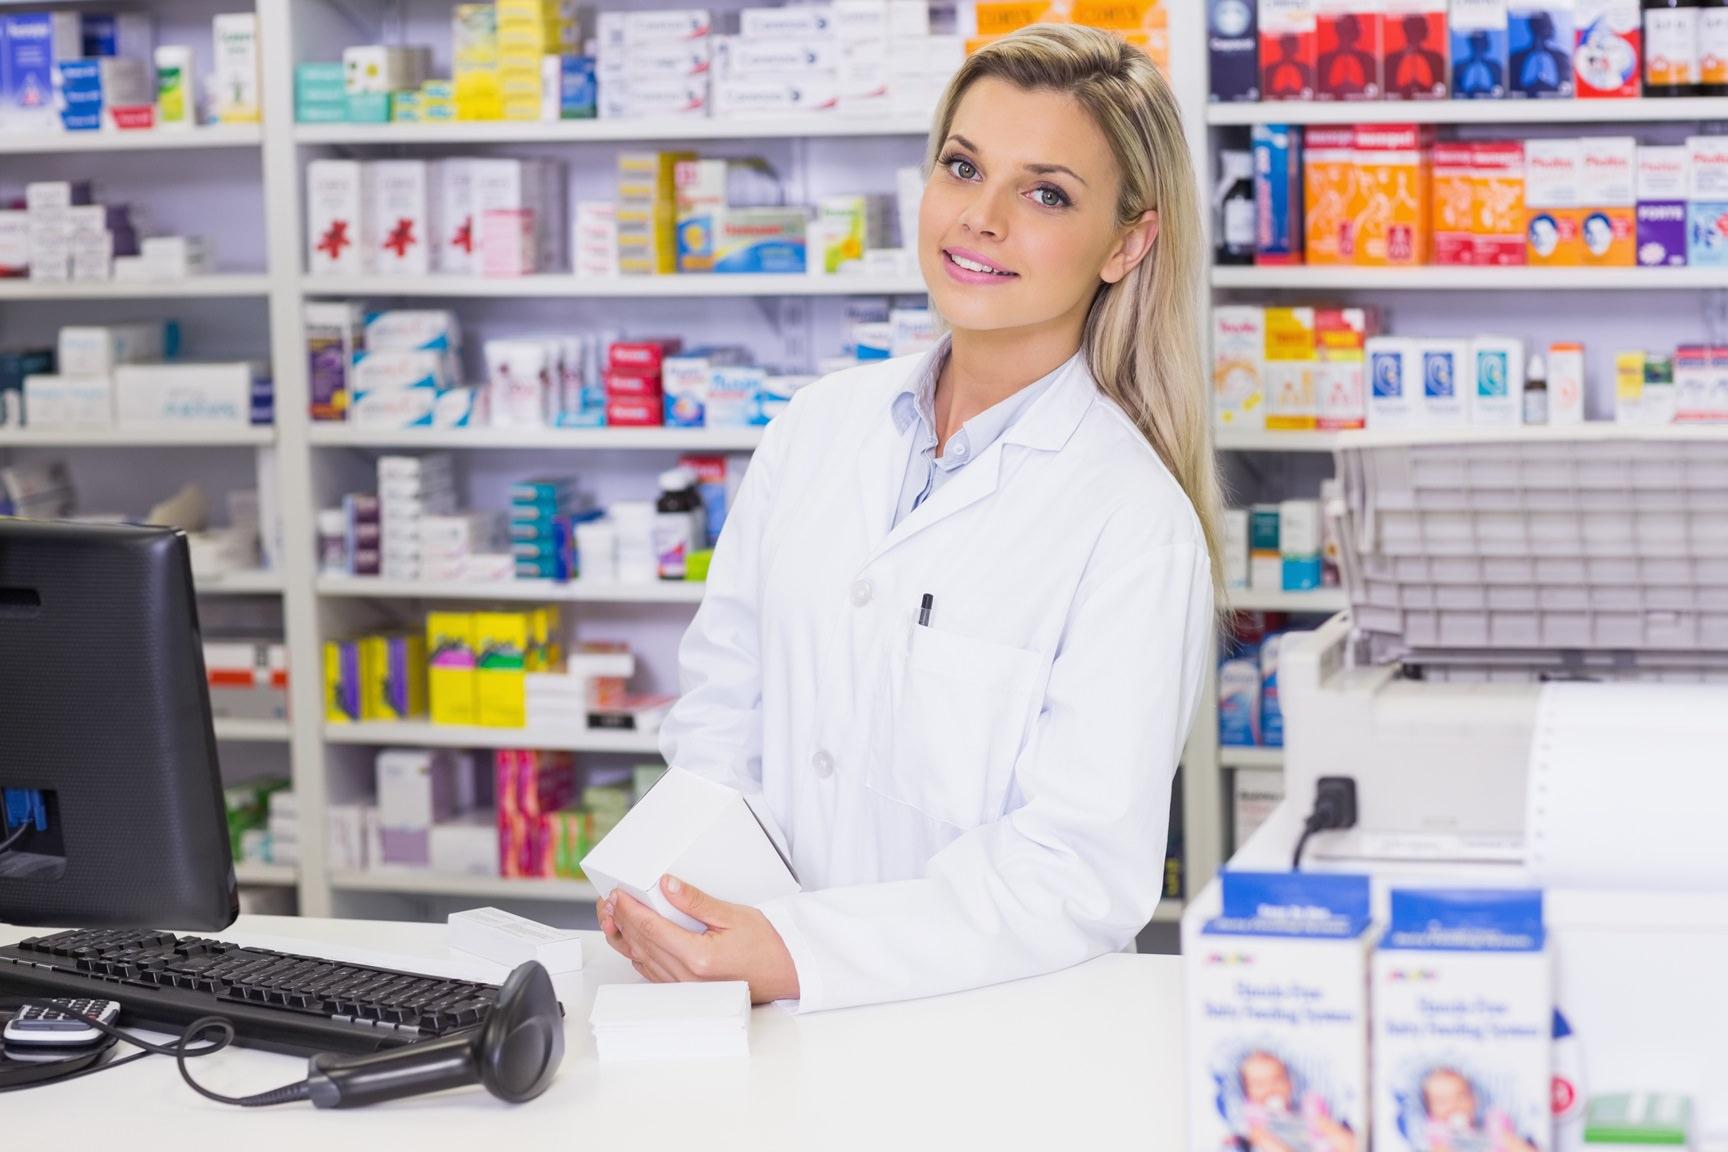 автомагазинах аптека фармацевты картинки том, что модерн